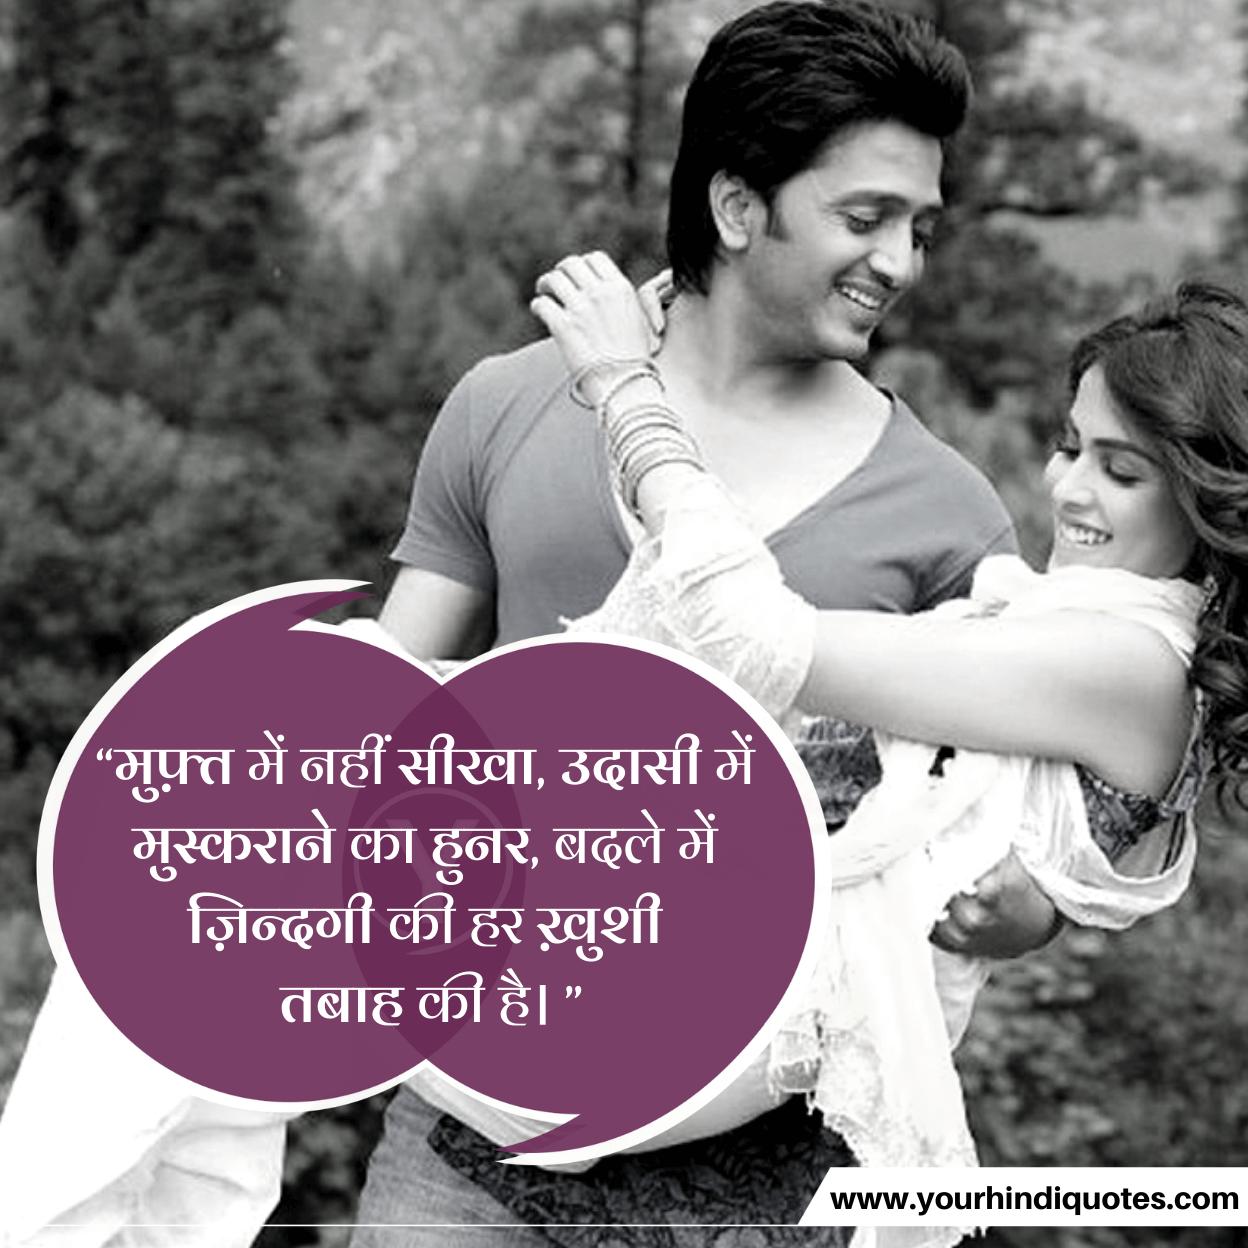 Hindi Sad Quotes pictures